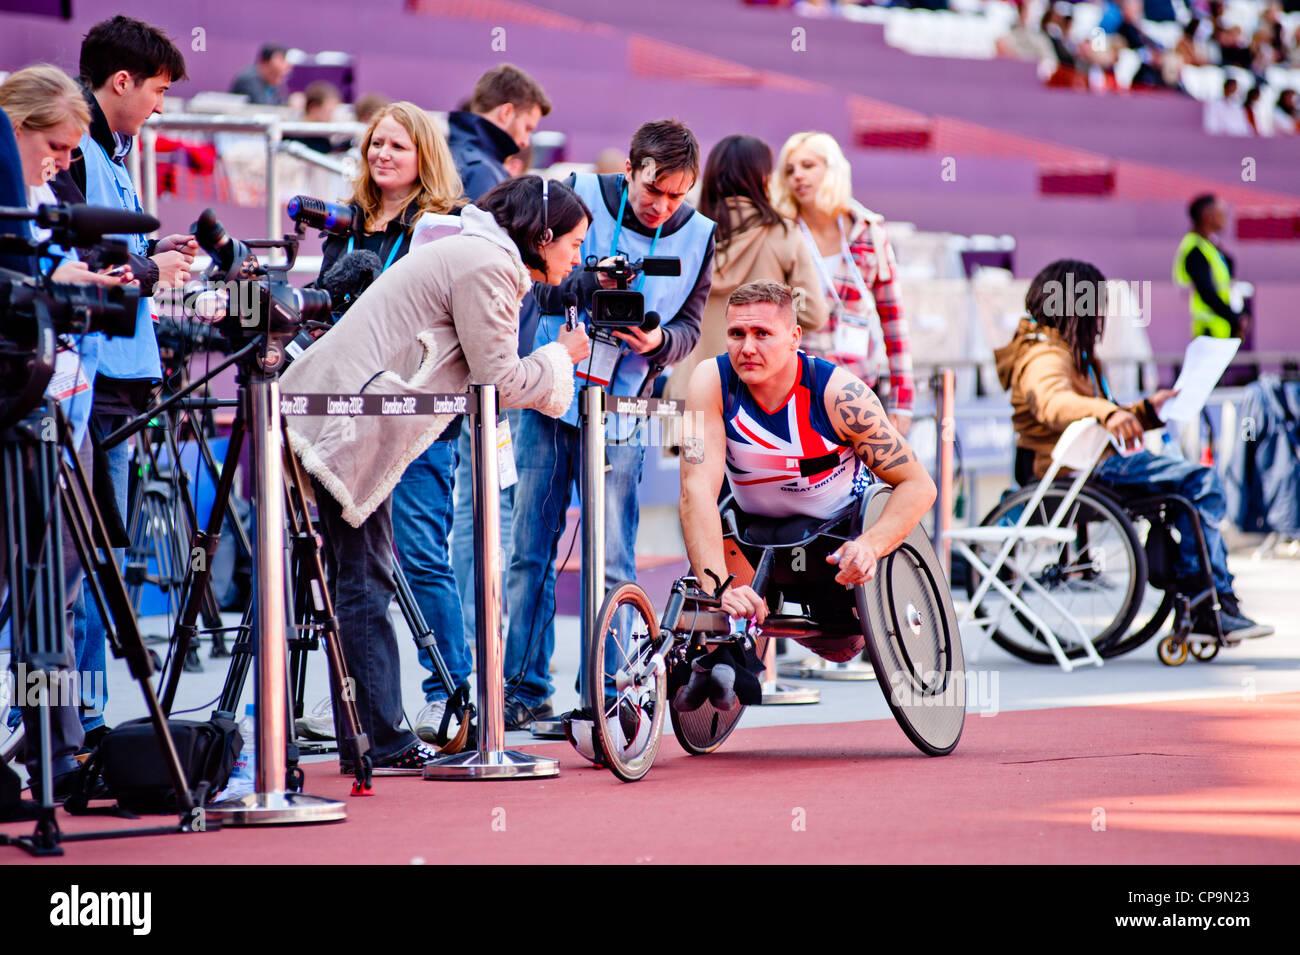 Athlet bei Visa London Disability Athletics Herausforderung im Olympiastadion am 8. Mai 2012 in London. Stockbild